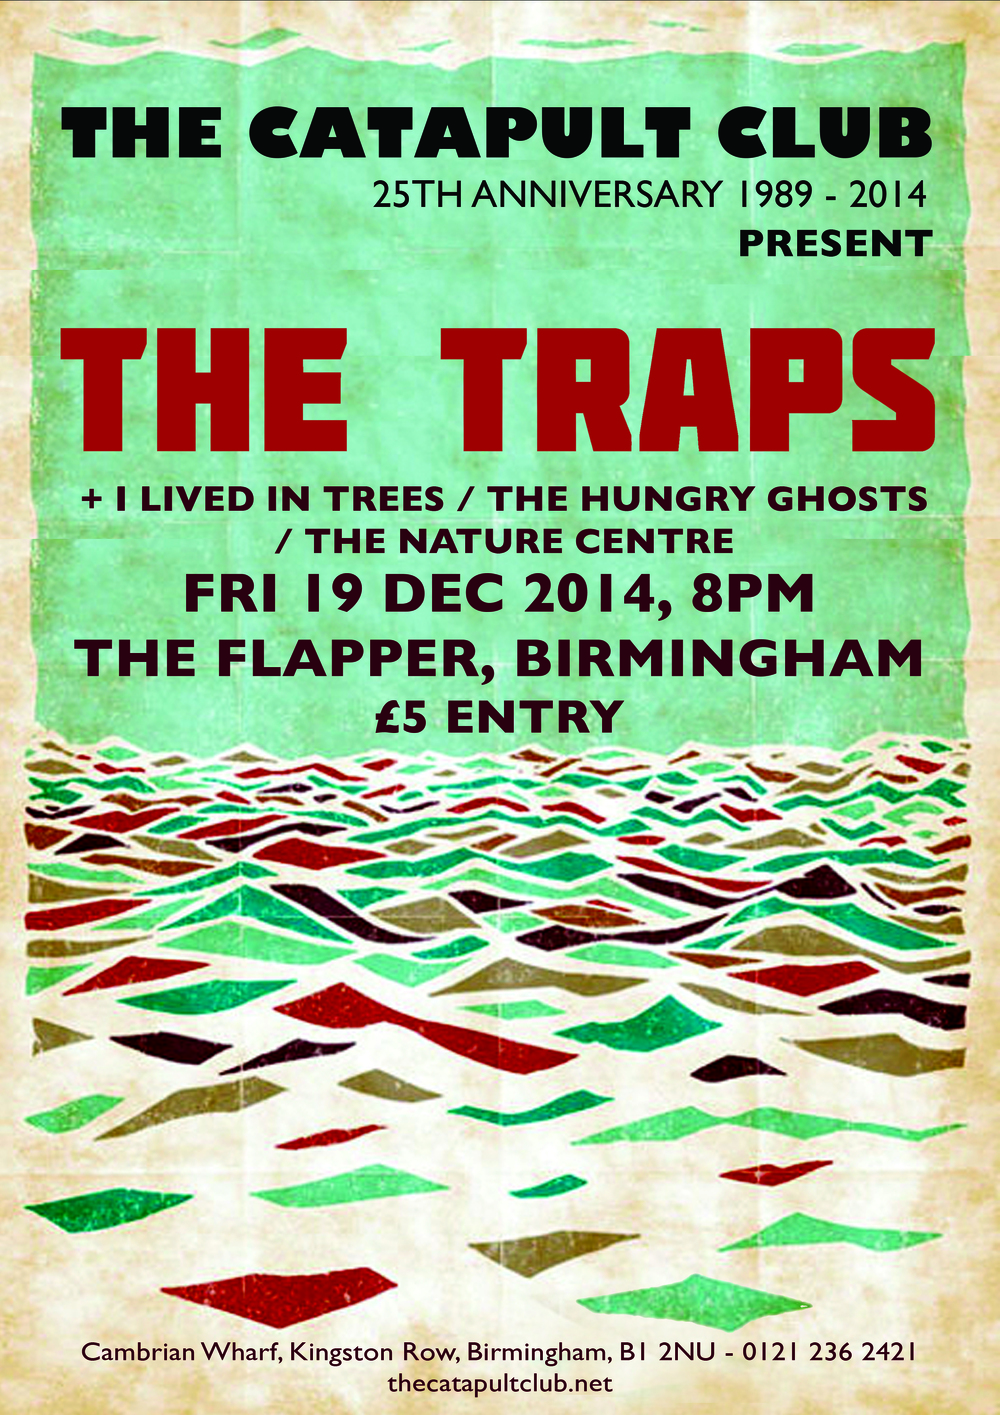 The Traps_Flapper_191114.jpg